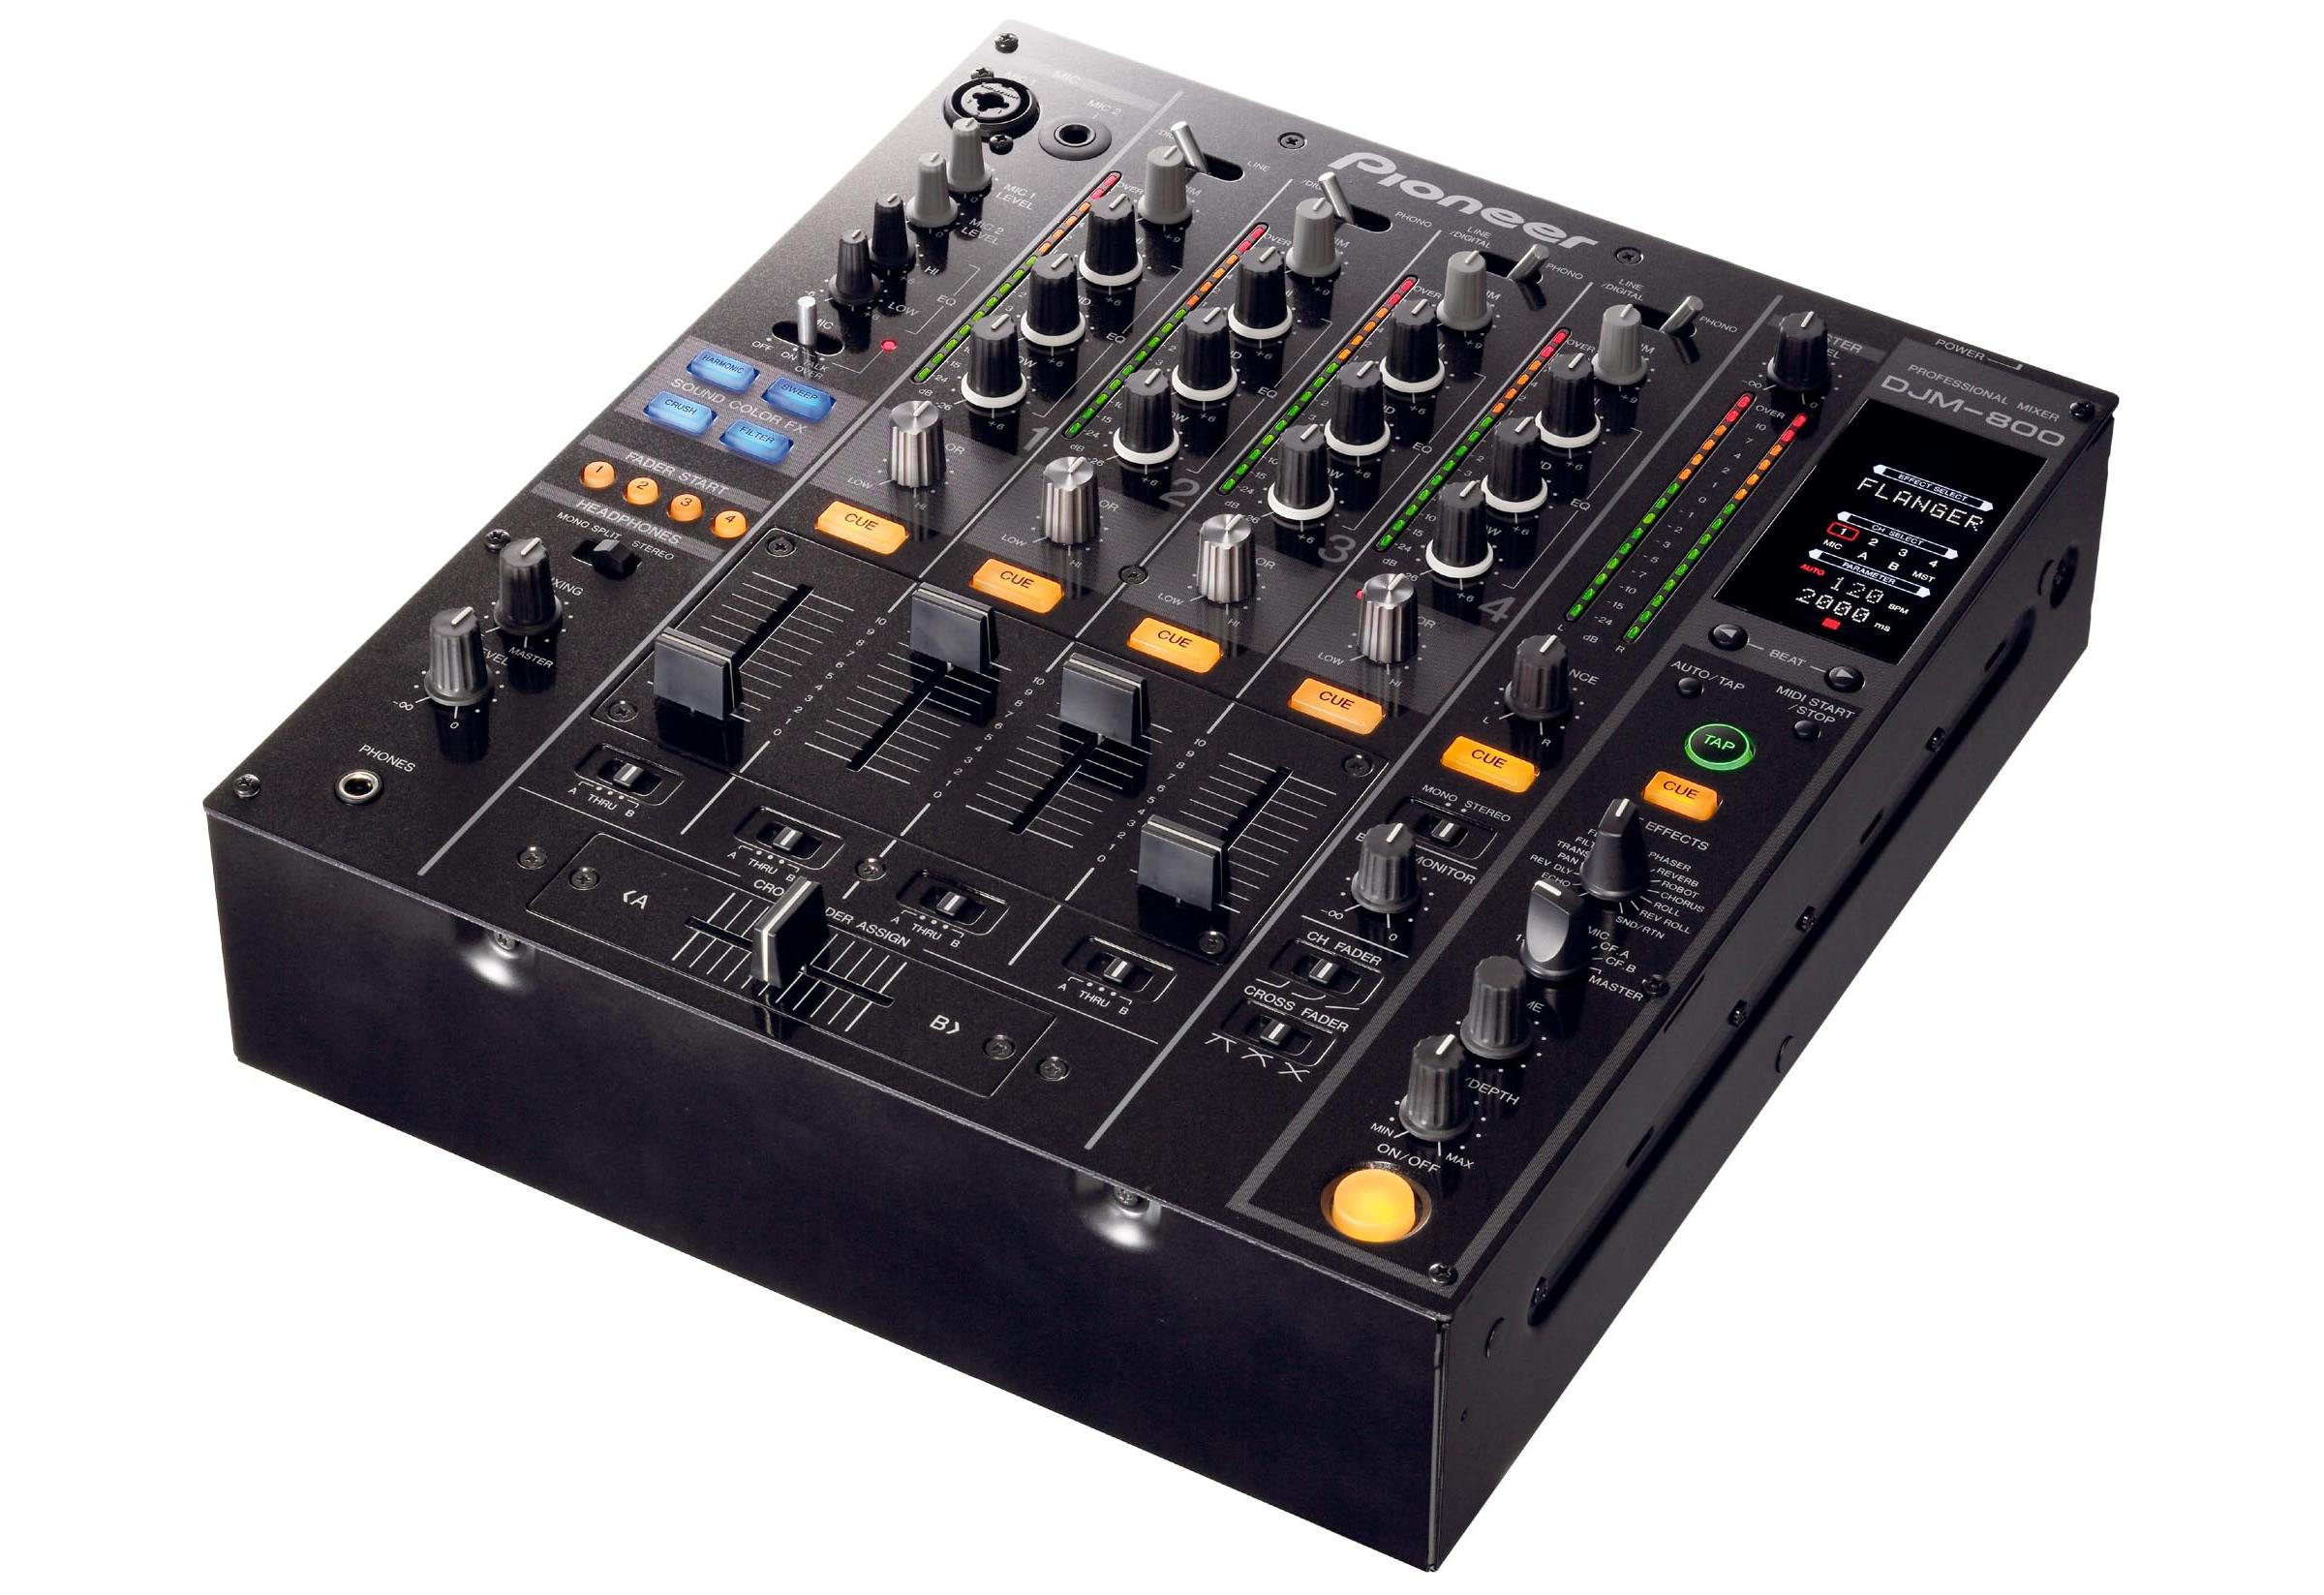 DJM800 edinburgh